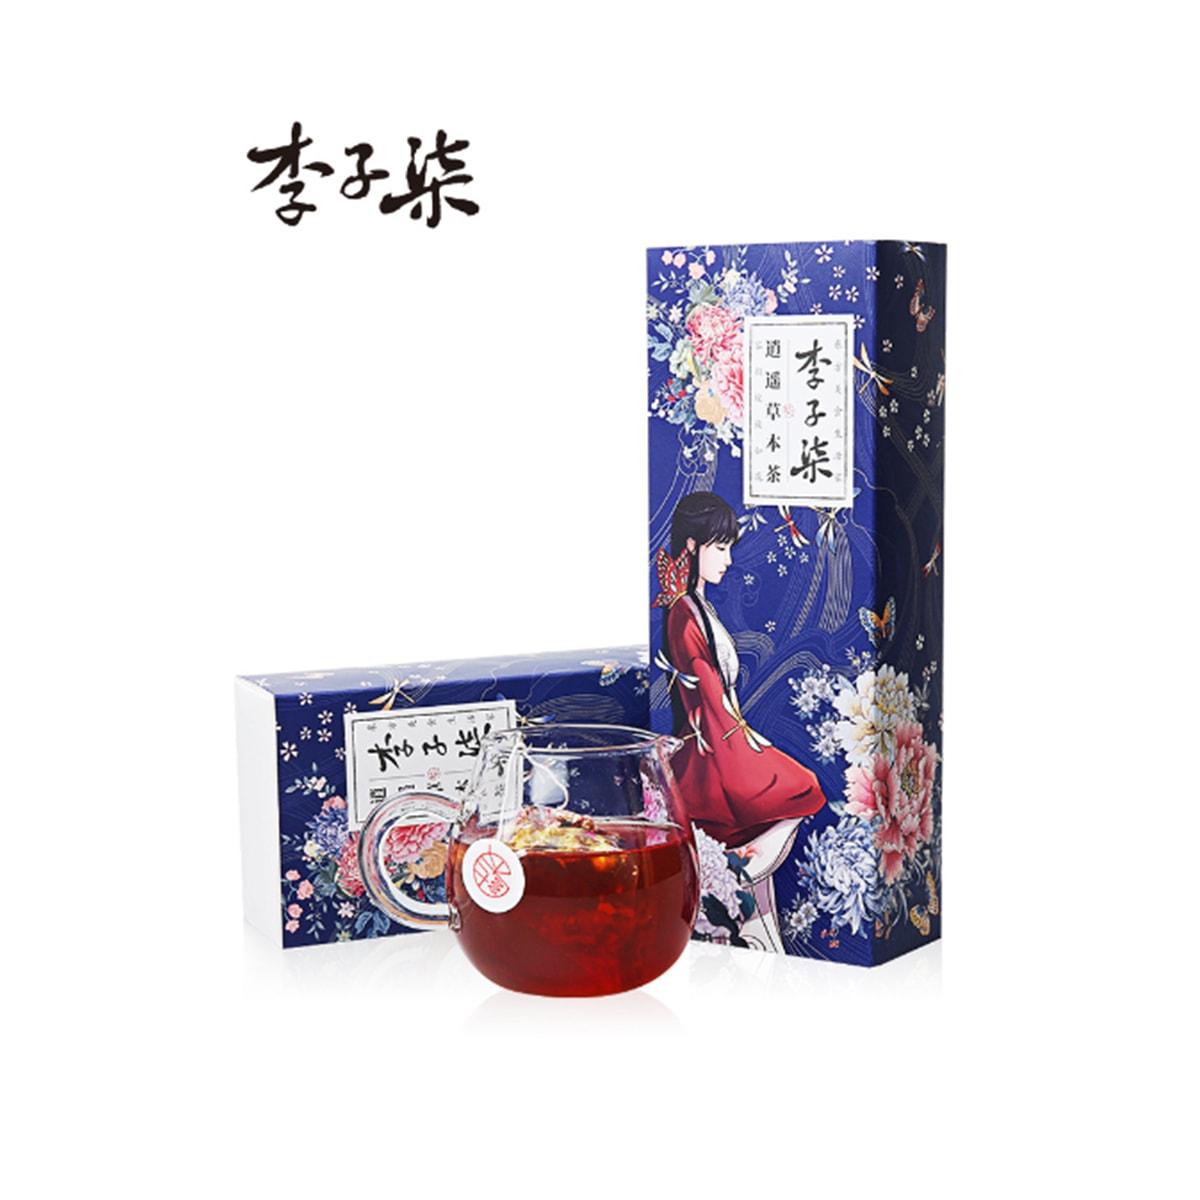 Yamibuy.com:Customer reviews:[China direct mail]  LIZIQI Xiaoyao herbal tea red bean glutinous rice flower tea combination raw tea 9g * 10 packs